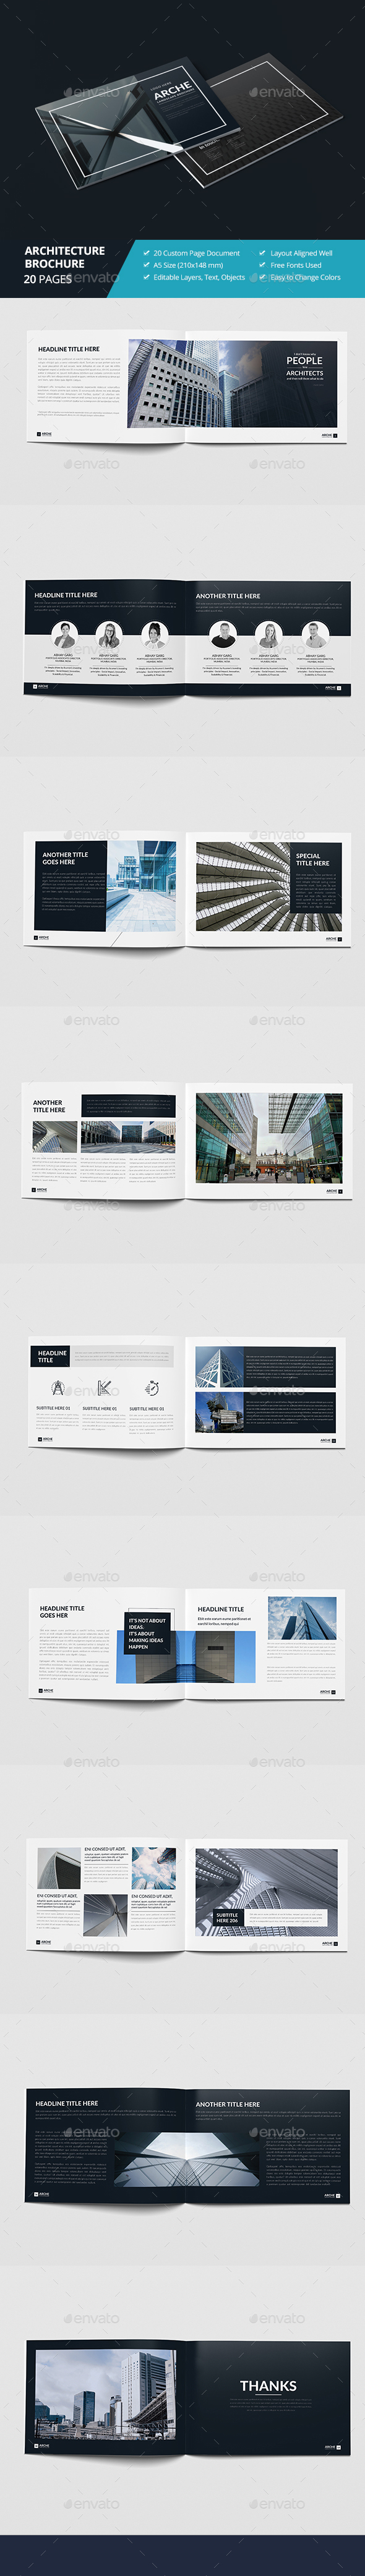 Haweya Architecture Brochure 02 - Brochures Print Templates